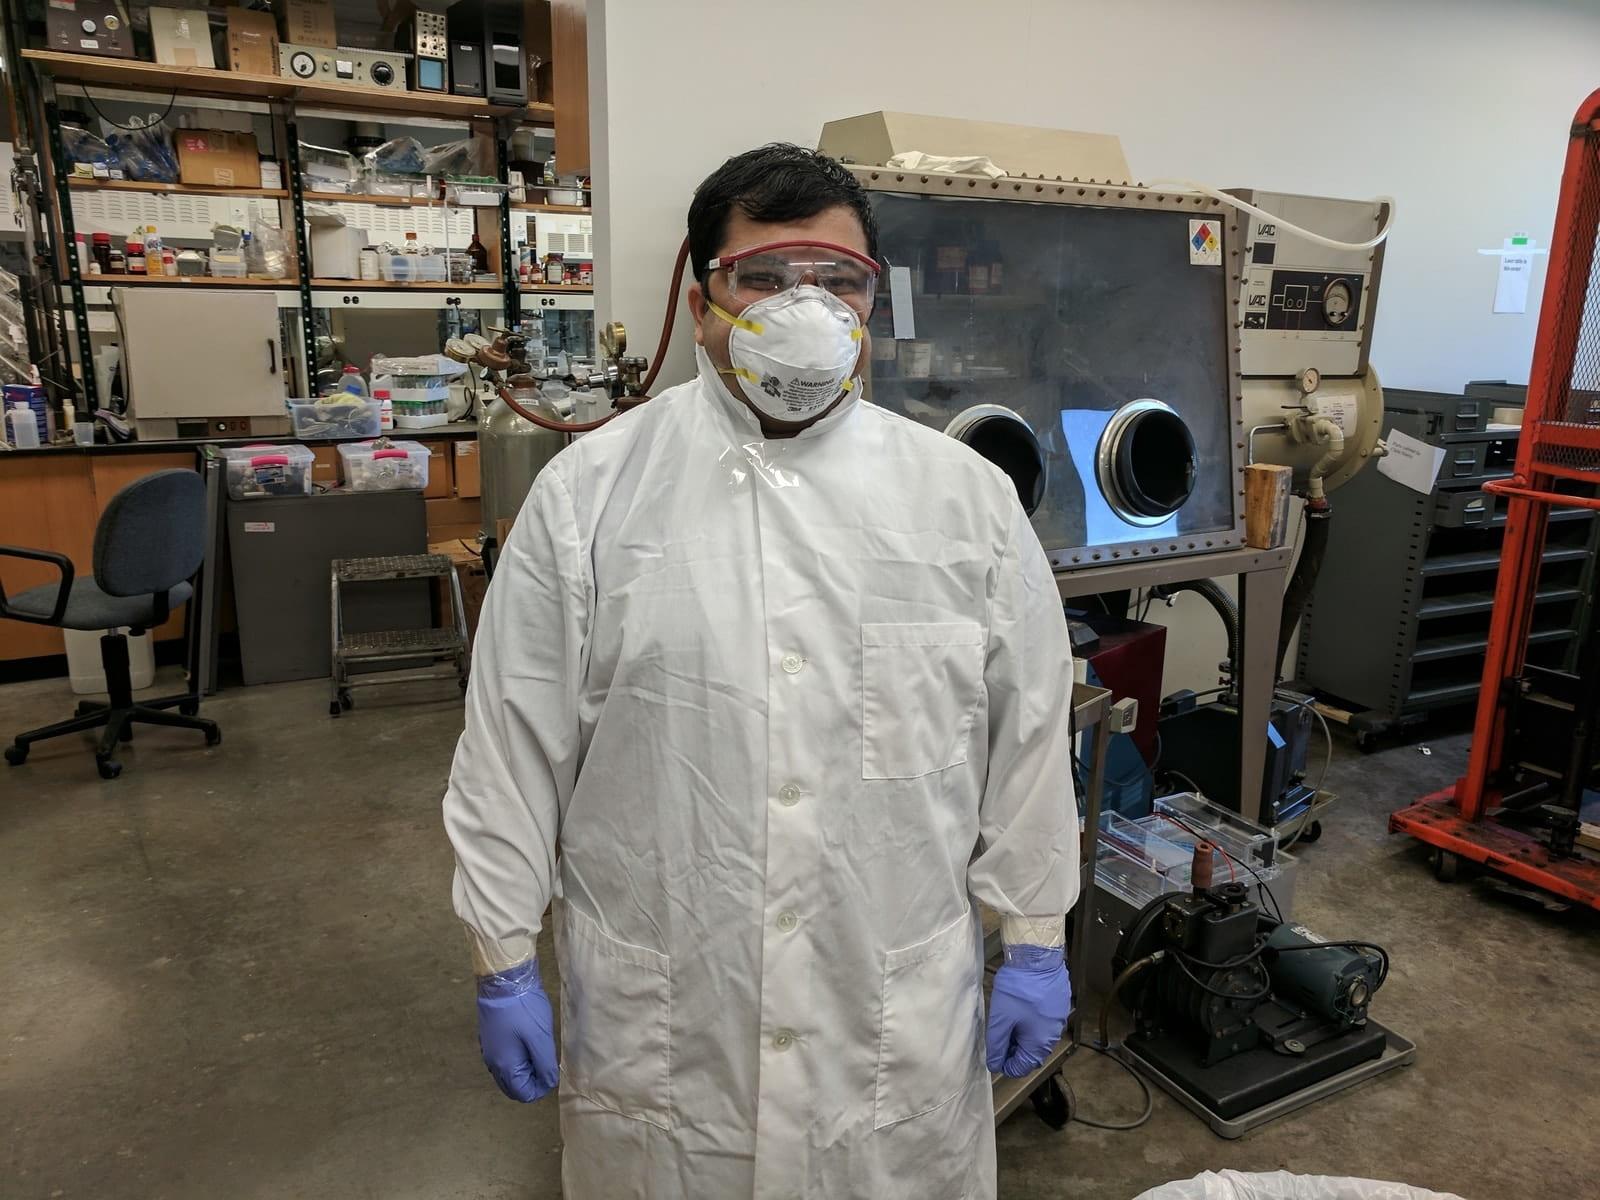 Nanomaterial safety on a nano budget